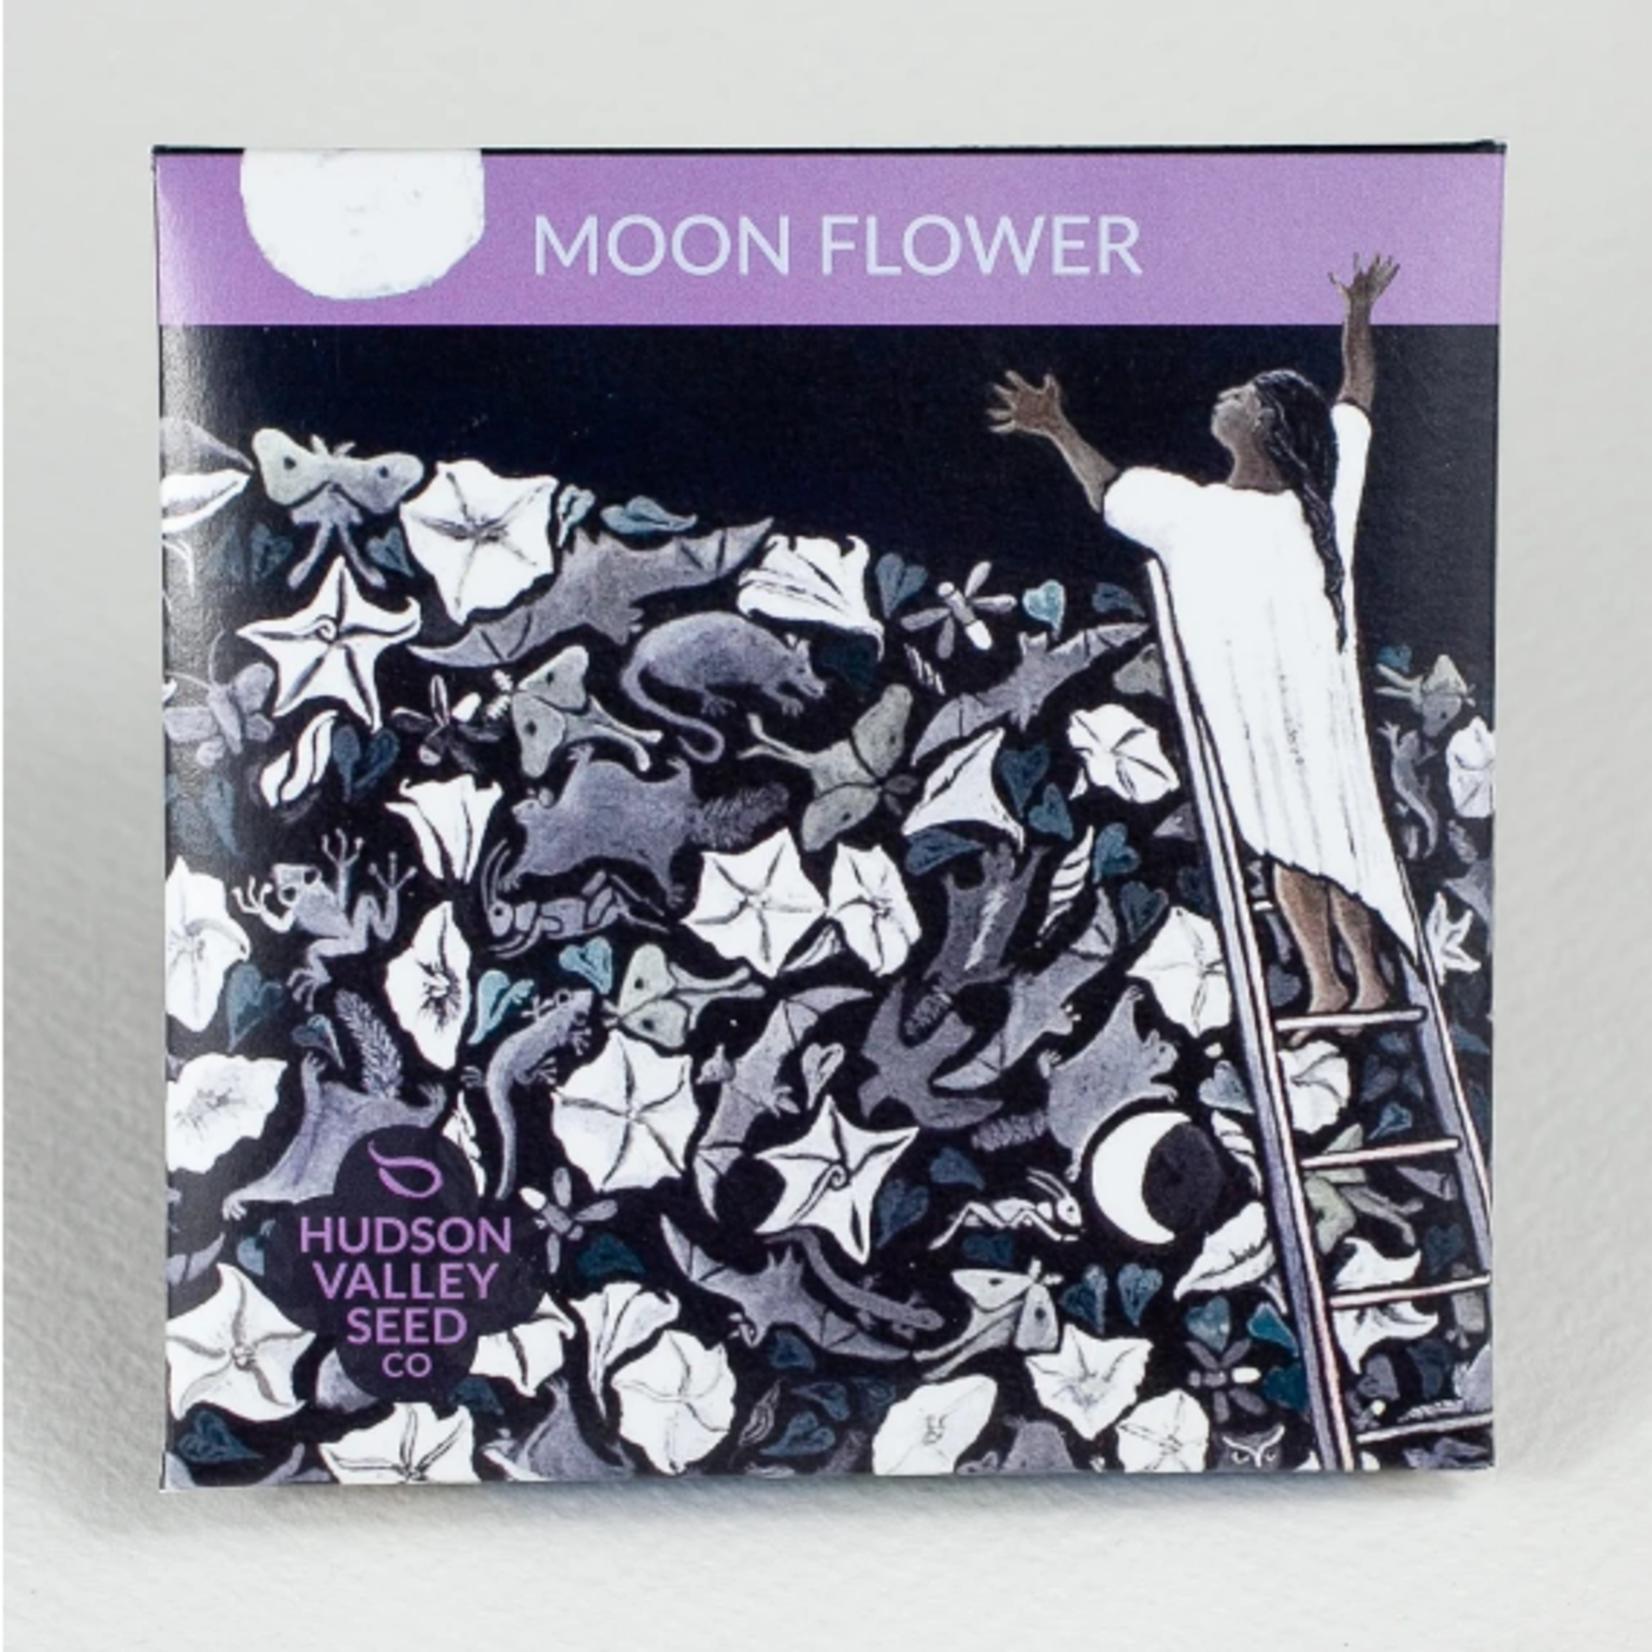 Hudson Valley Seeds Moon Flower Seeds